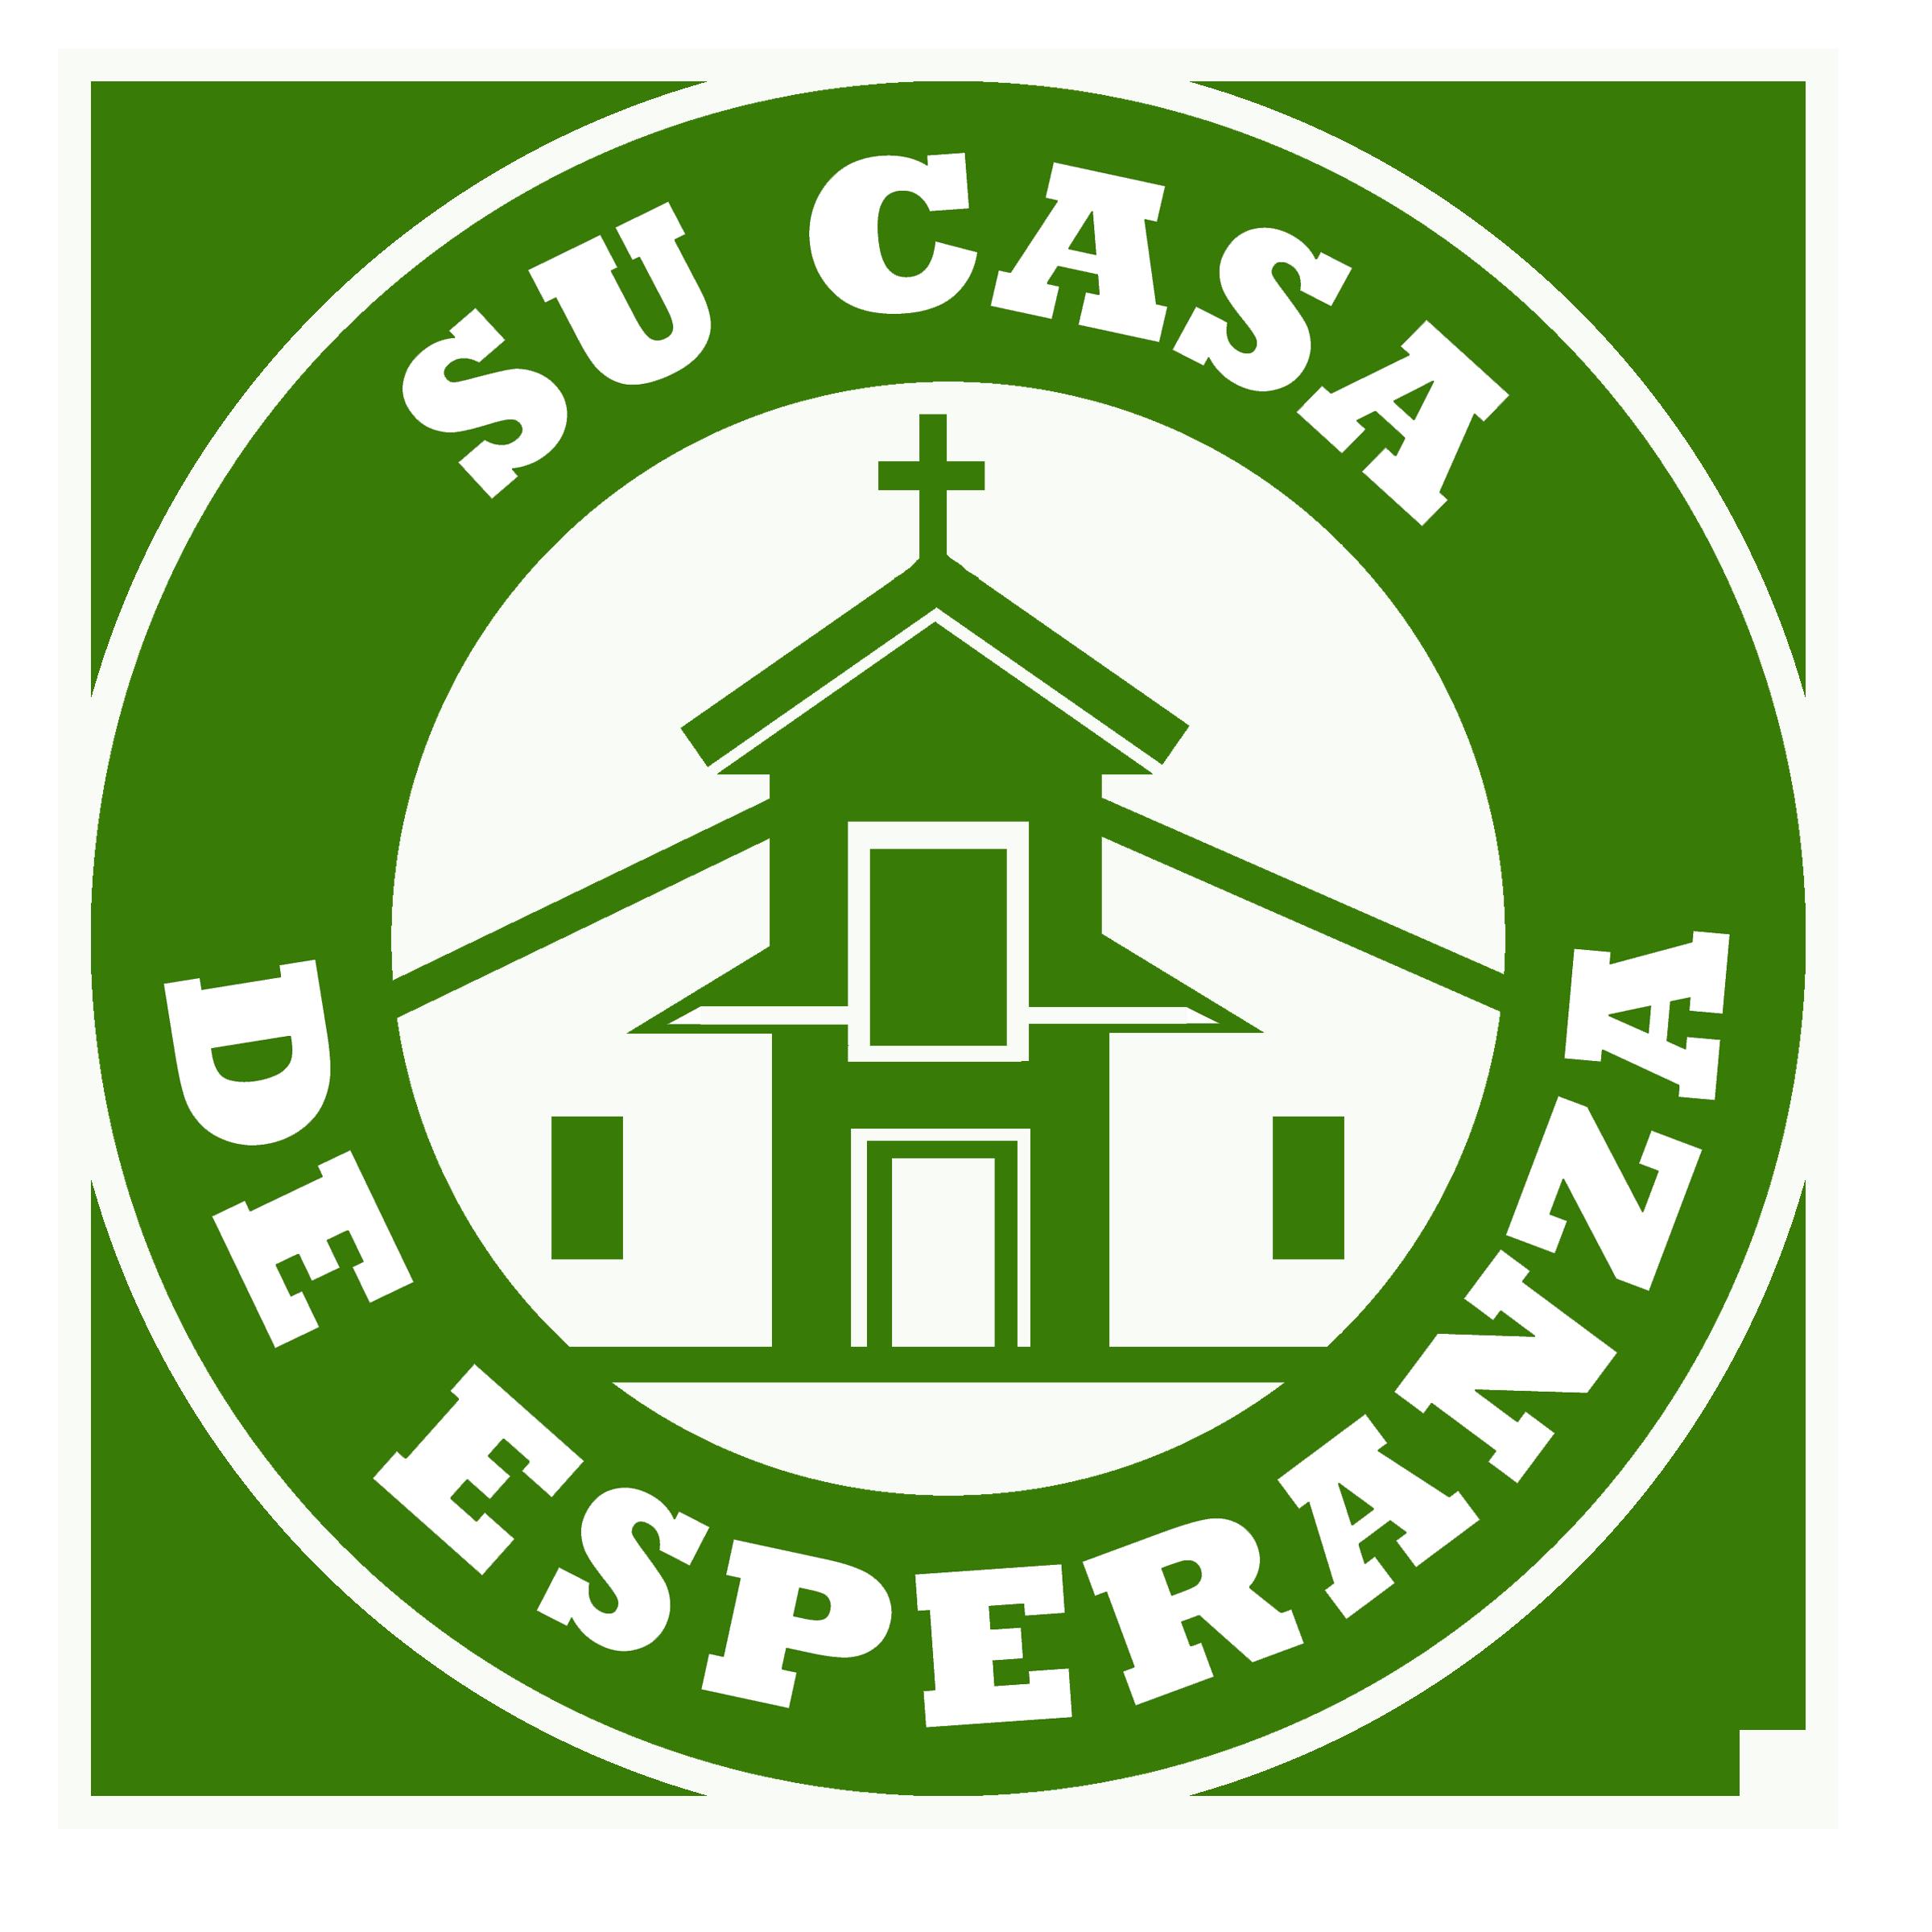 SuCasaLogo2.png